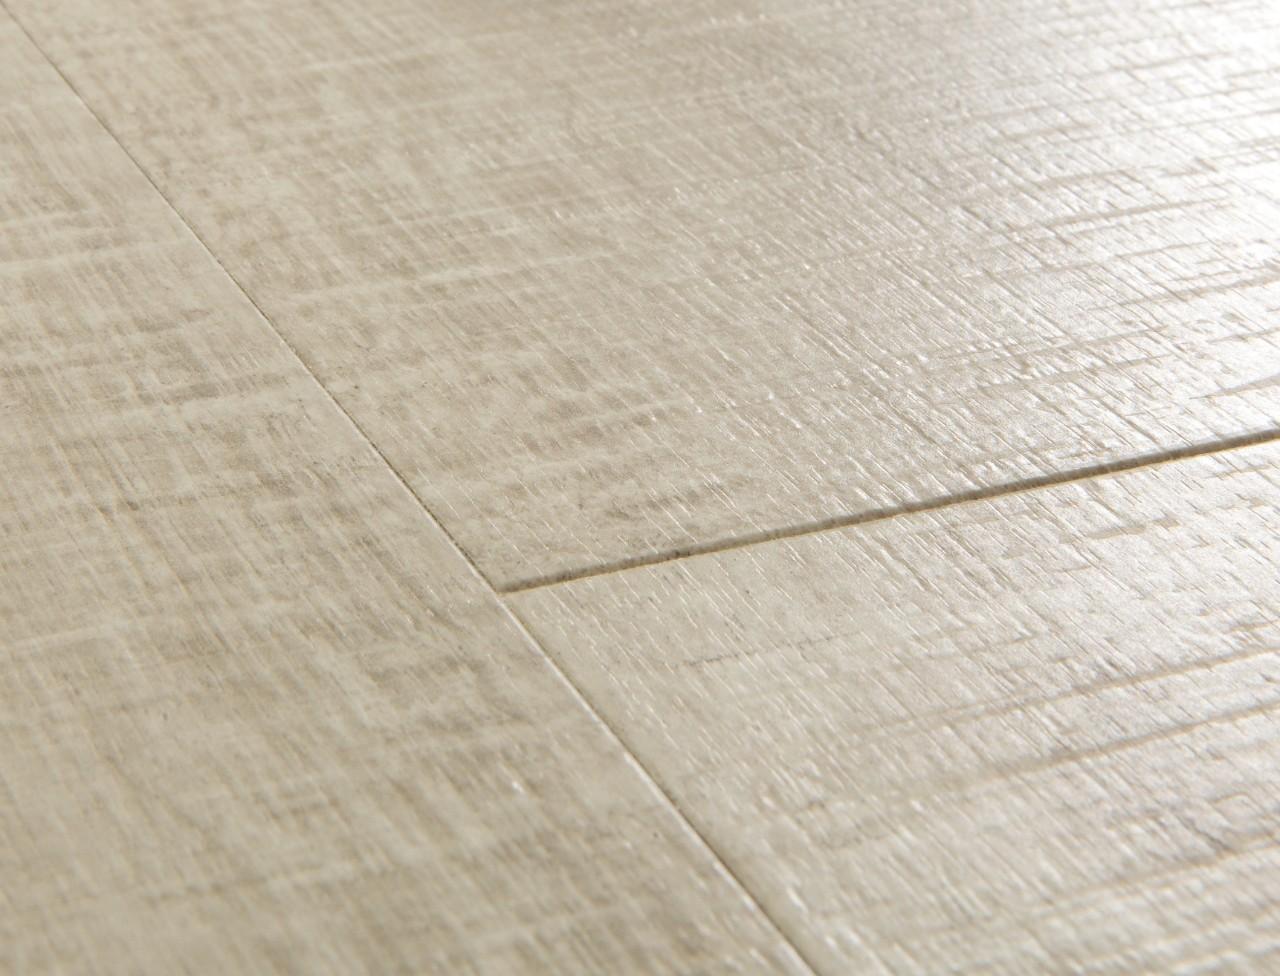 Im1857 saw cut oak beige quick for Quick step parquet flooring